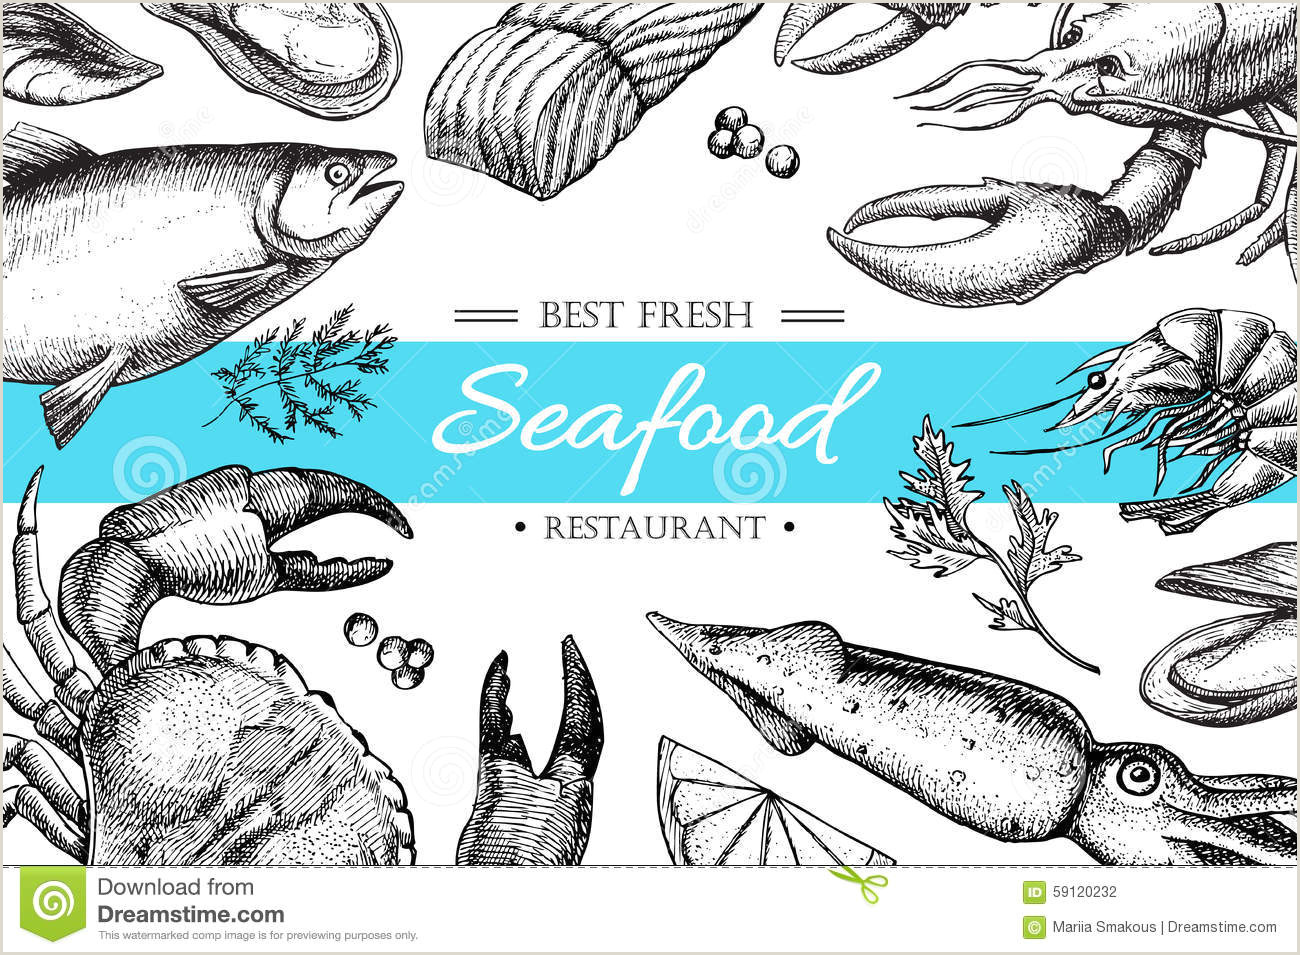 Restraurants Best Business Cards Restaurant Illustration Stock Illustrations – 628 607